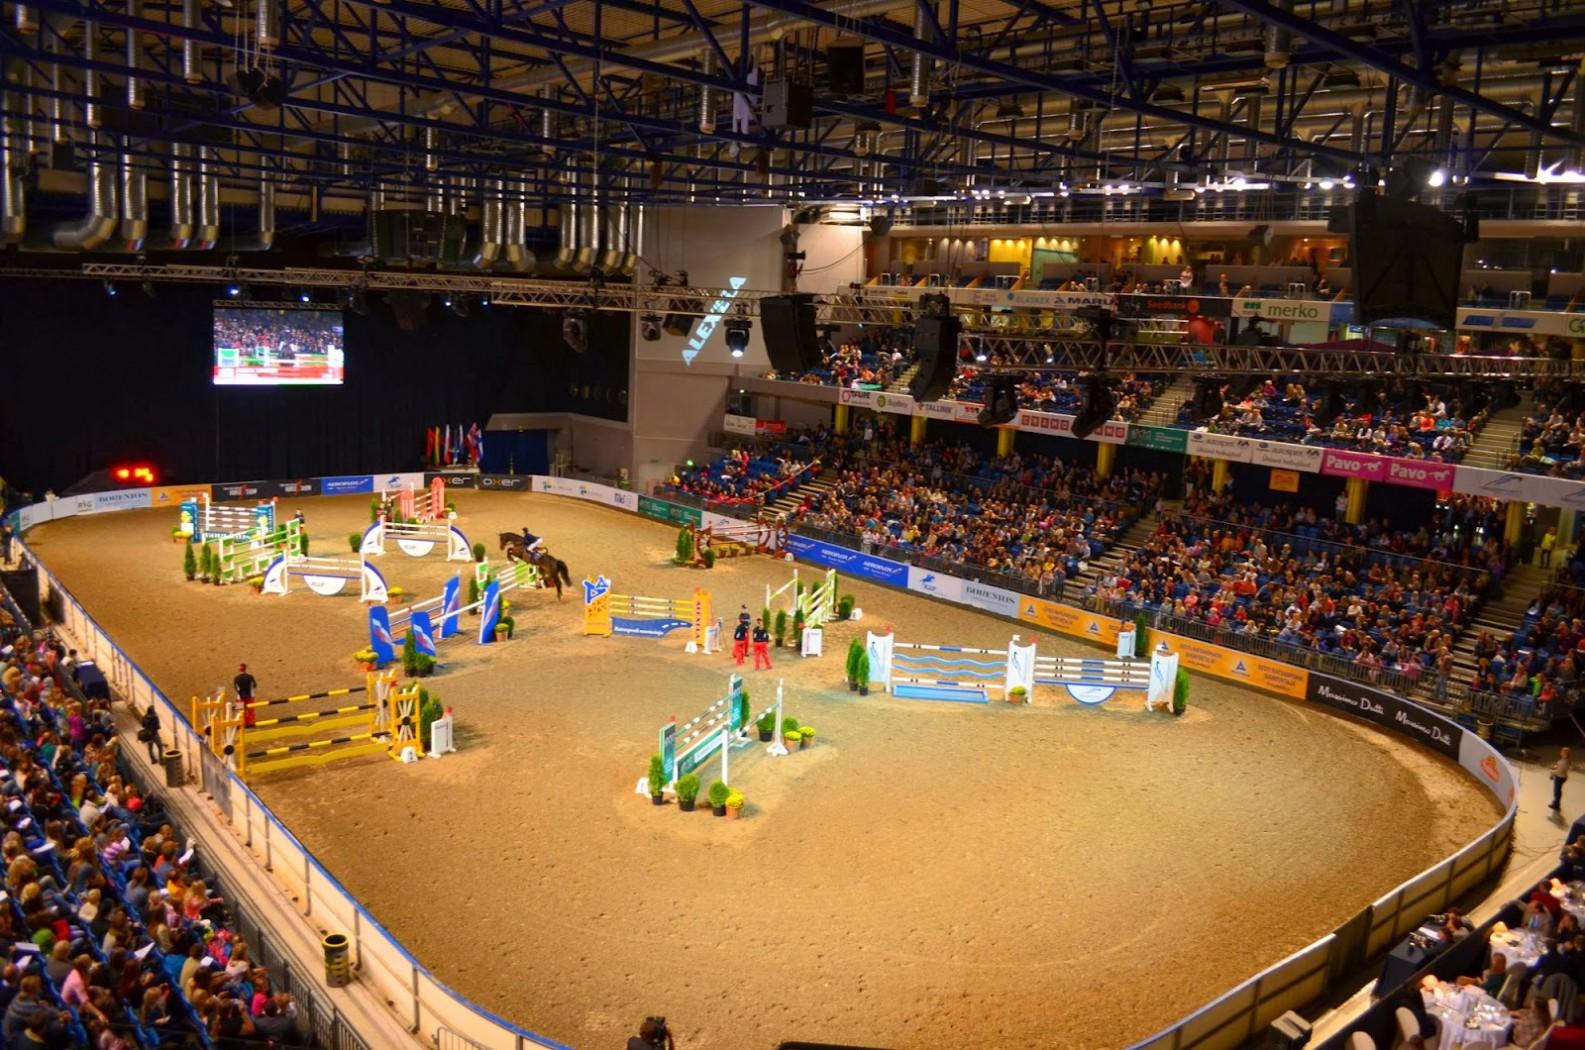 tallinn international horse show euroopa kultuurilinnad